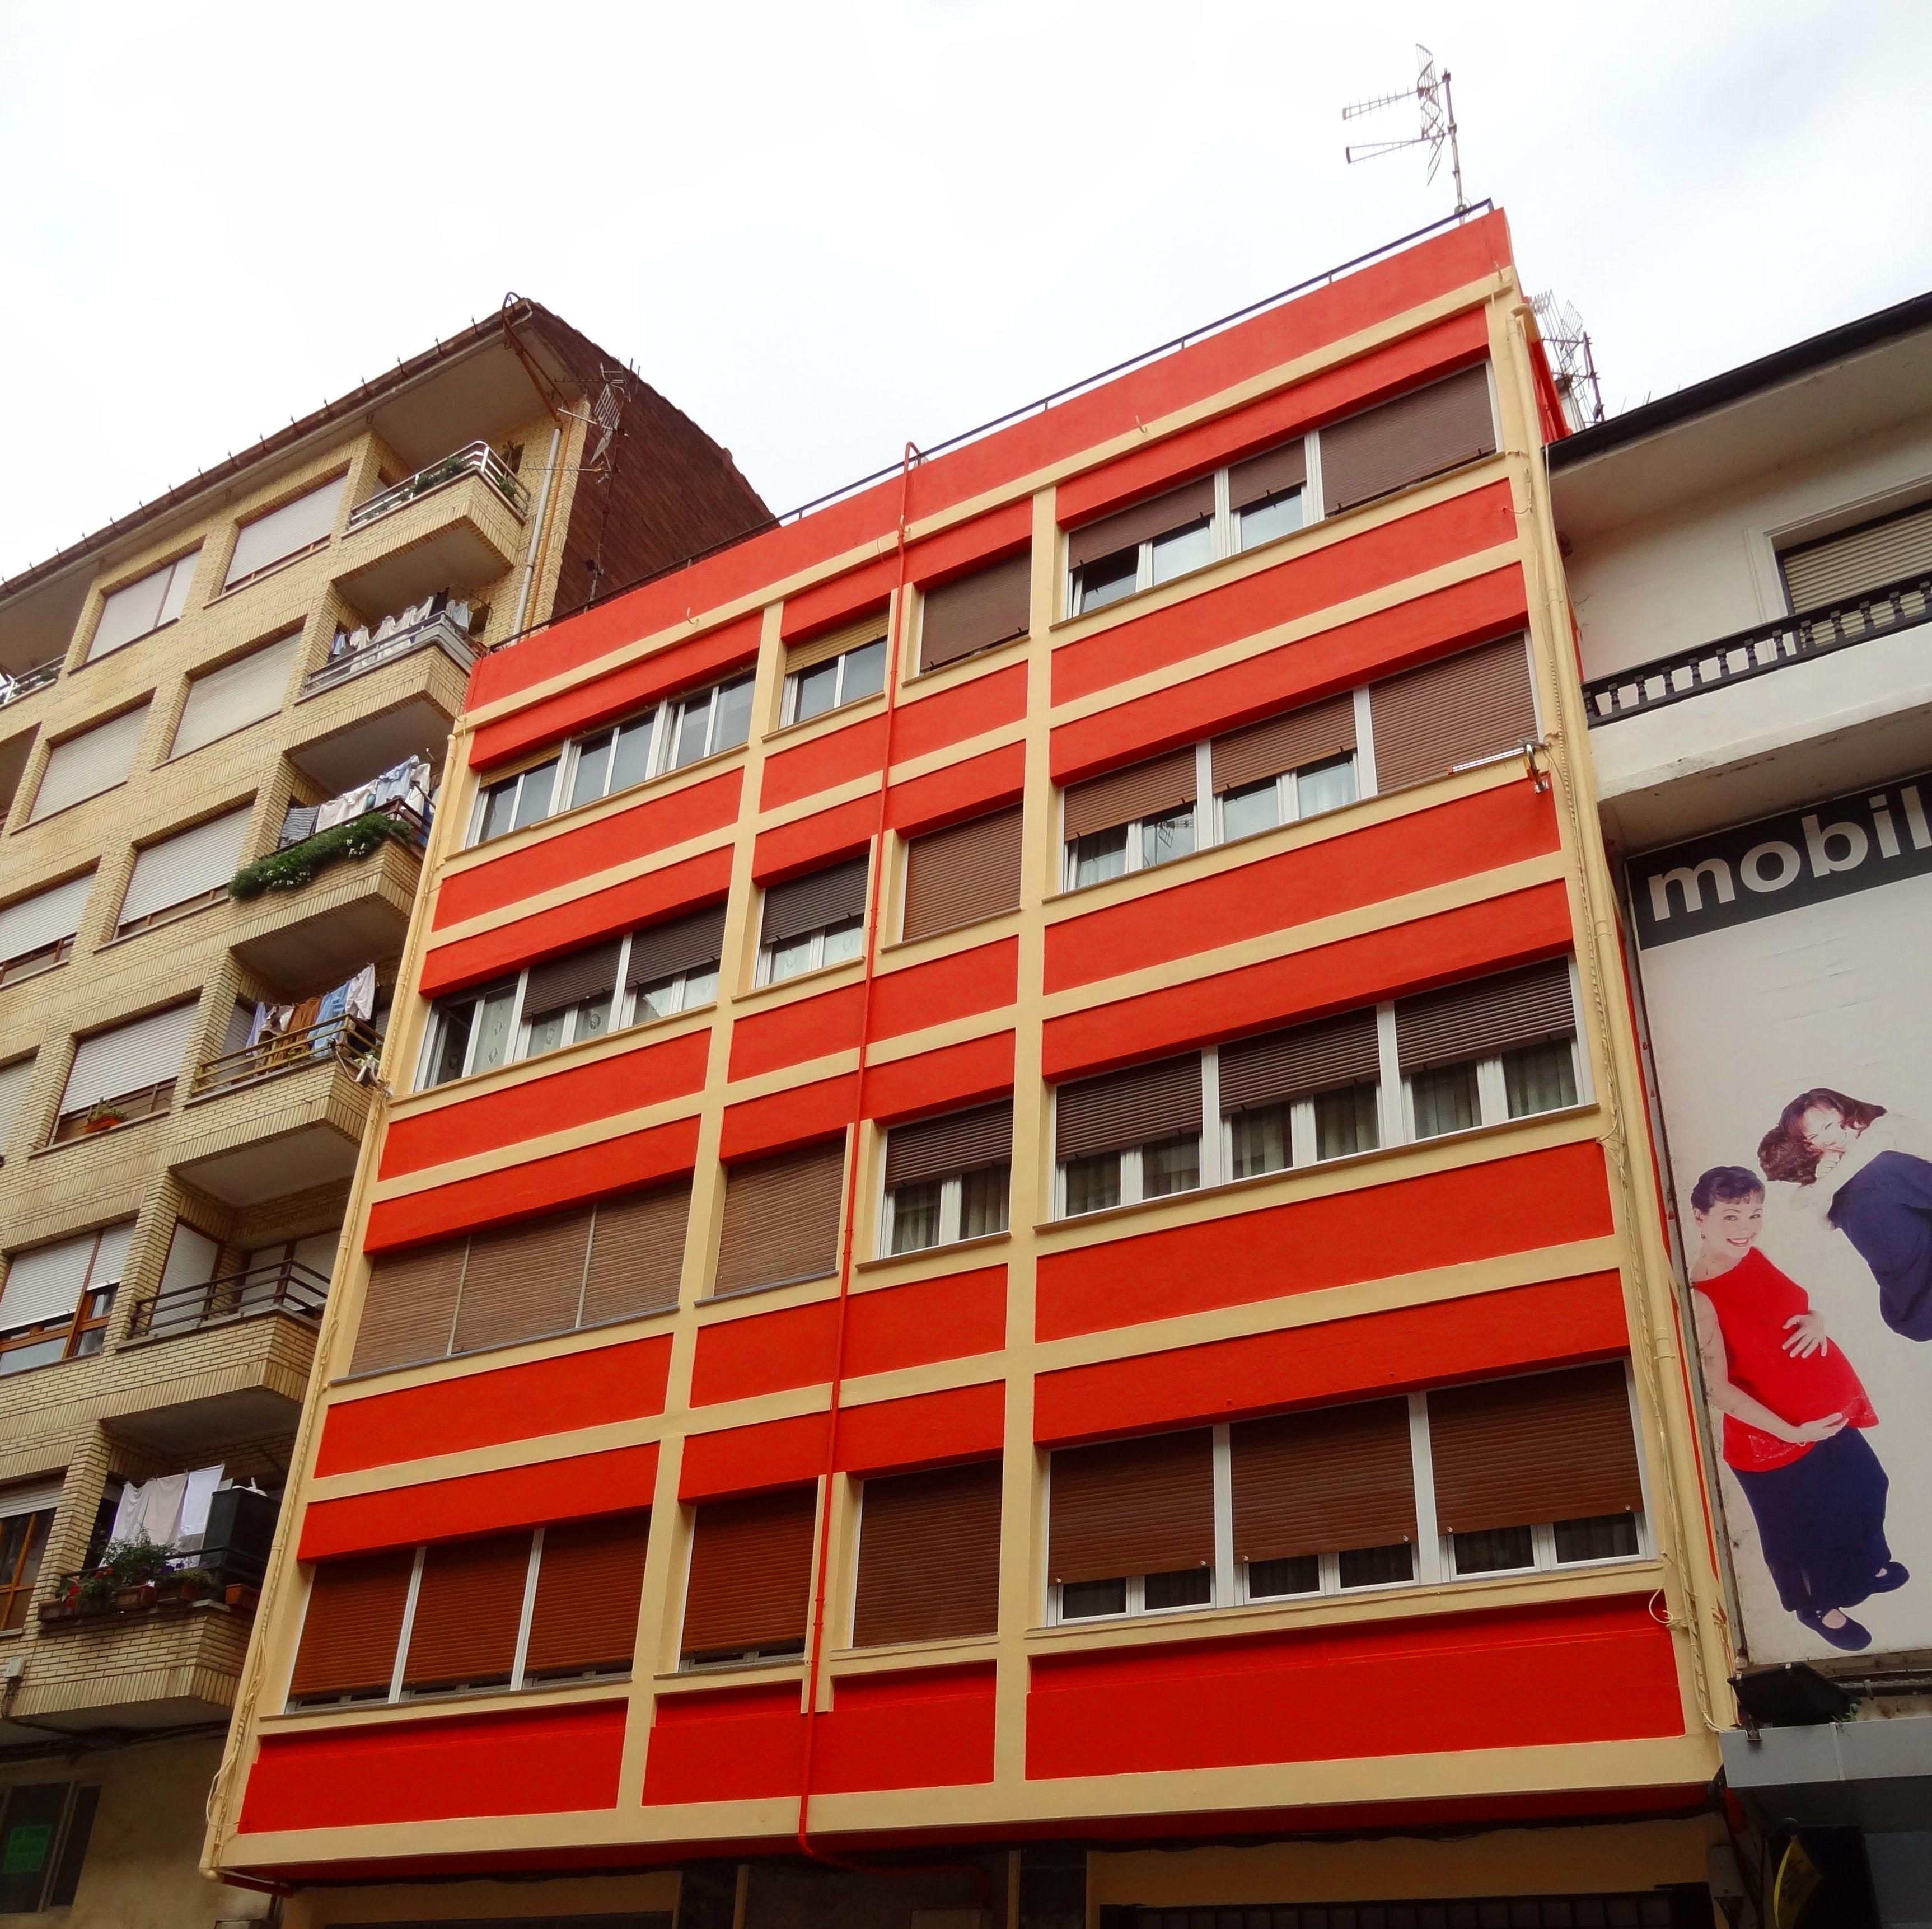 Rehabilitación integral de fachadas en Torrelavega-Santander